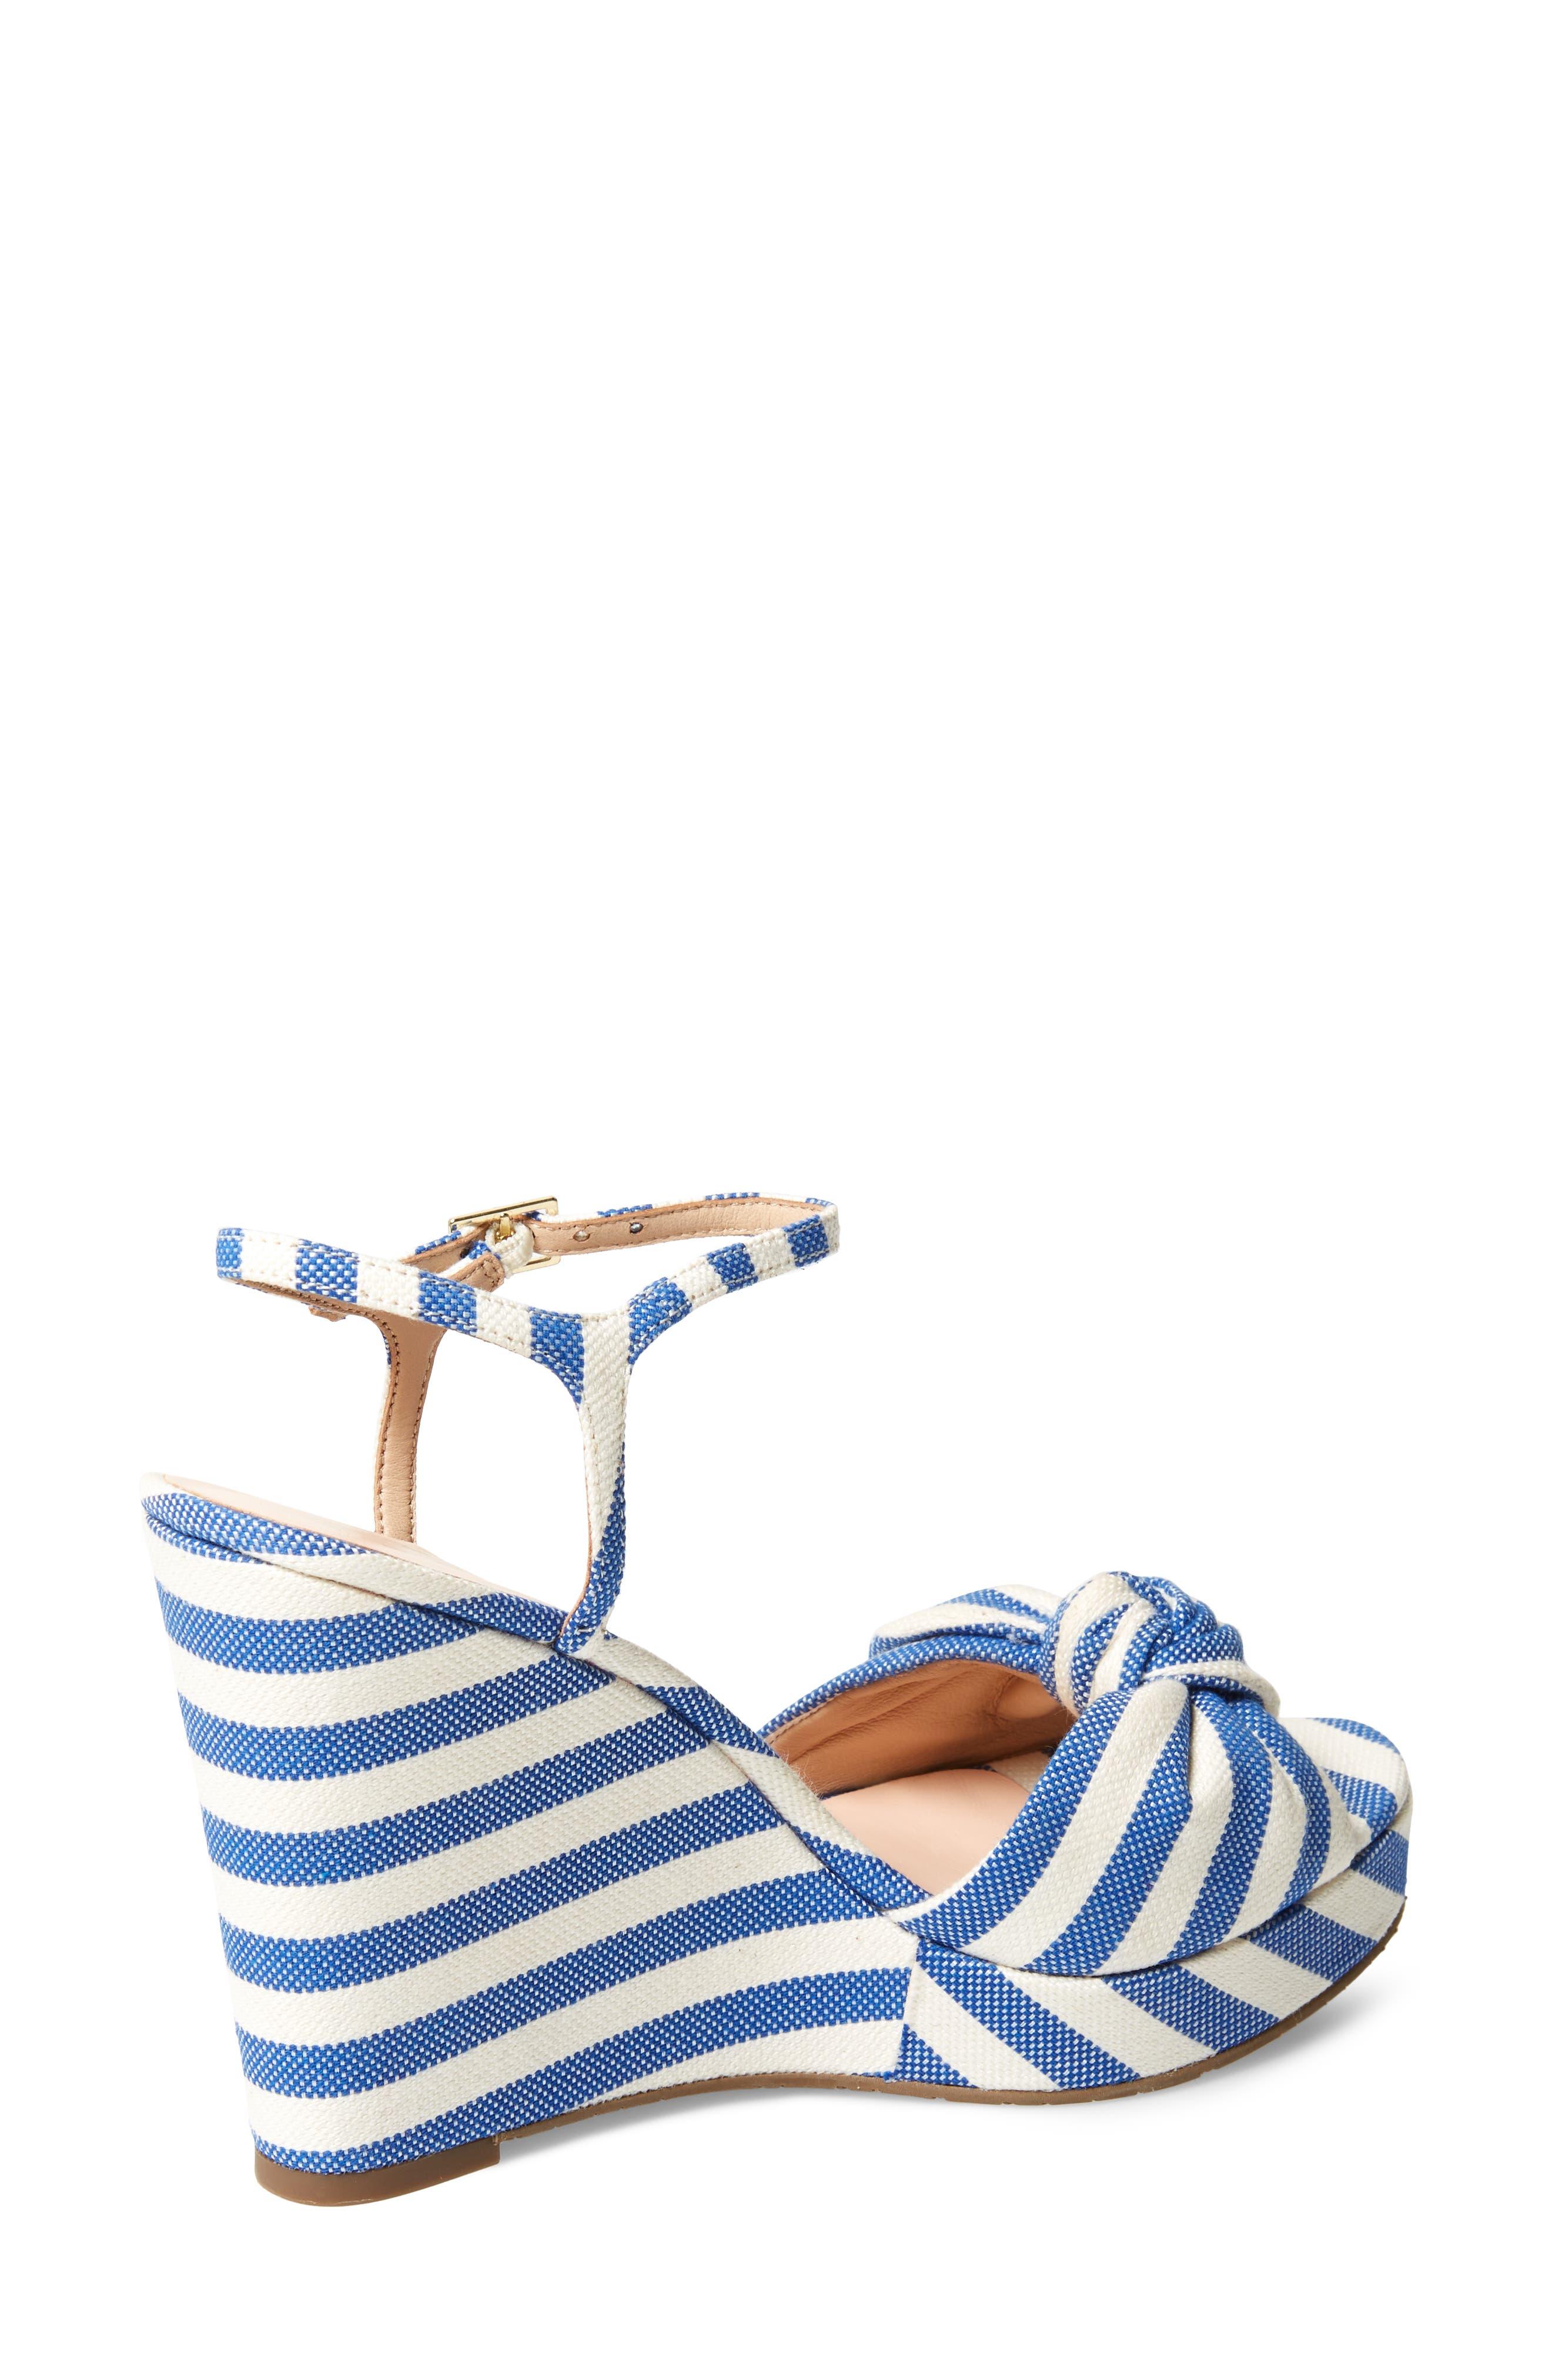 janae knot platform wedge sandal,                             Alternate thumbnail 2, color,                             Blue/Cream Stripe